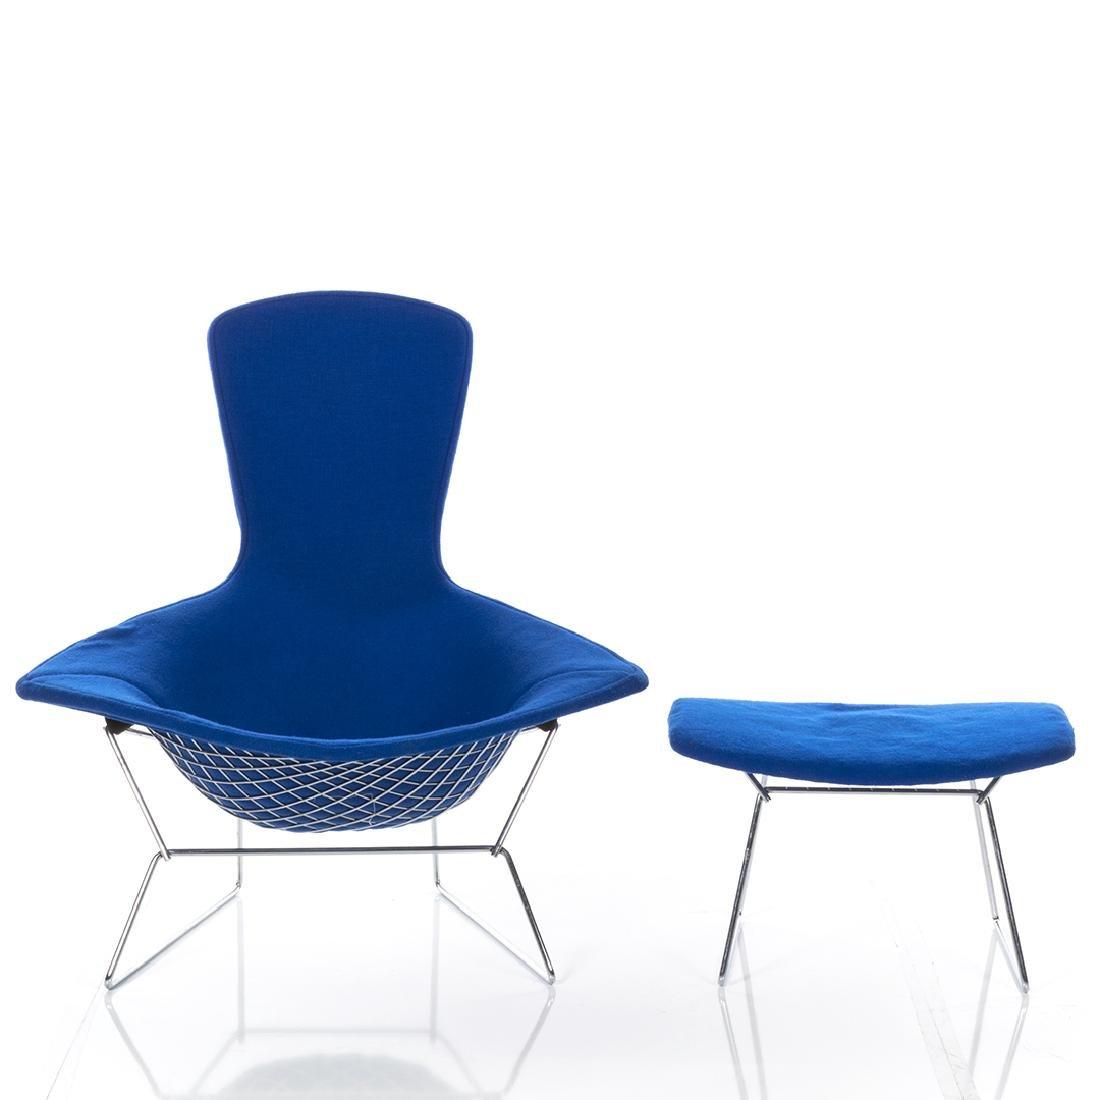 Harry Bertoia Bird Chair and Ottoman - 3